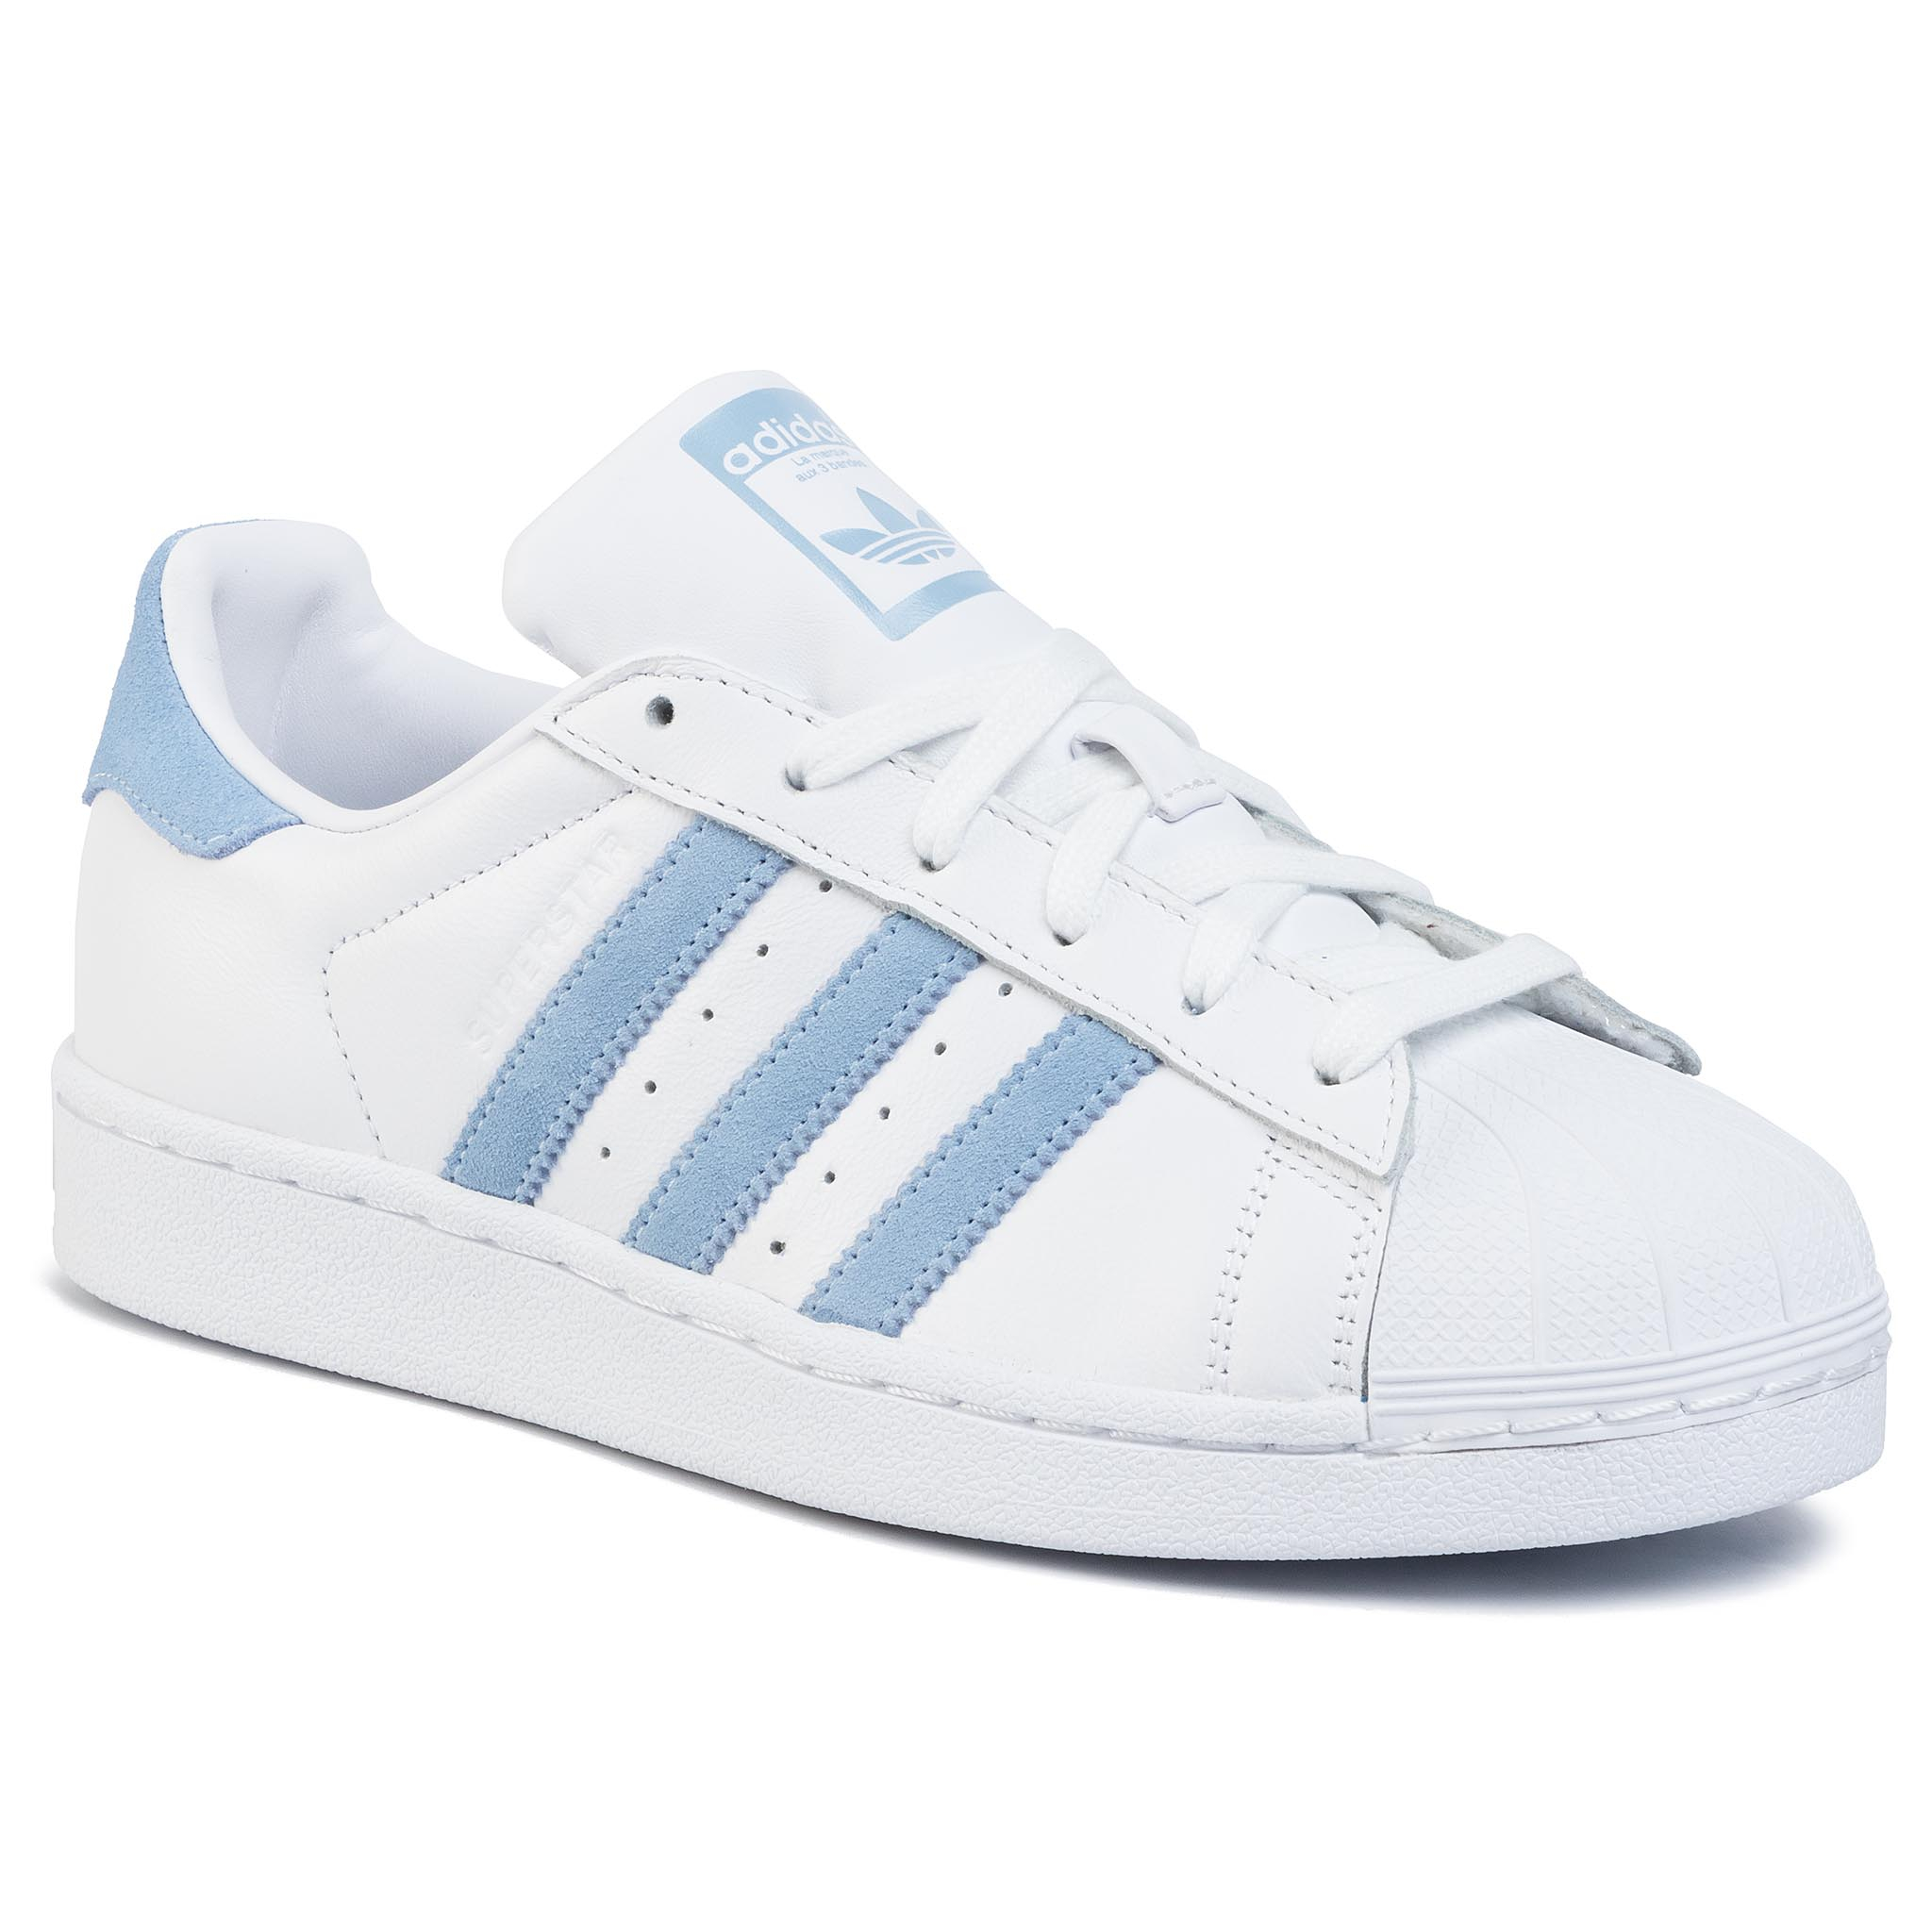 Topánky adidas - Superstar EF9239 Ftwwht/Globlu/Ftwwht